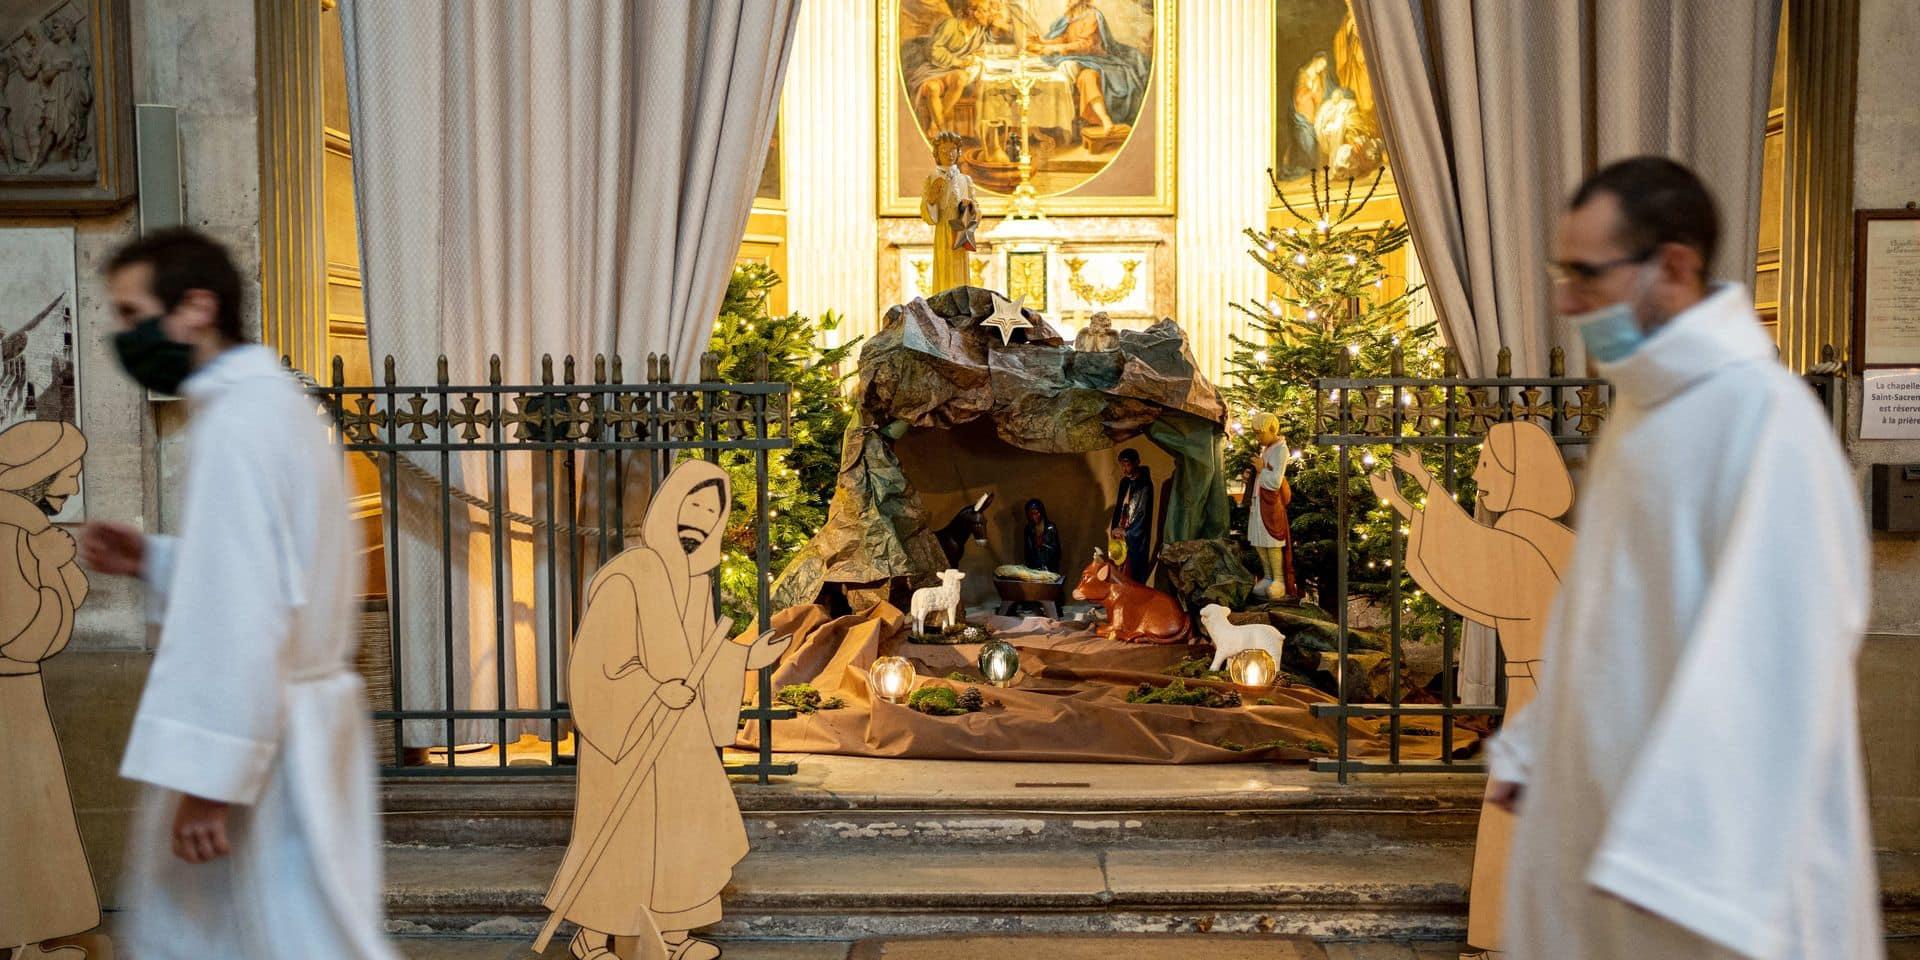 Christmas Nativity Scene In Church - Paris